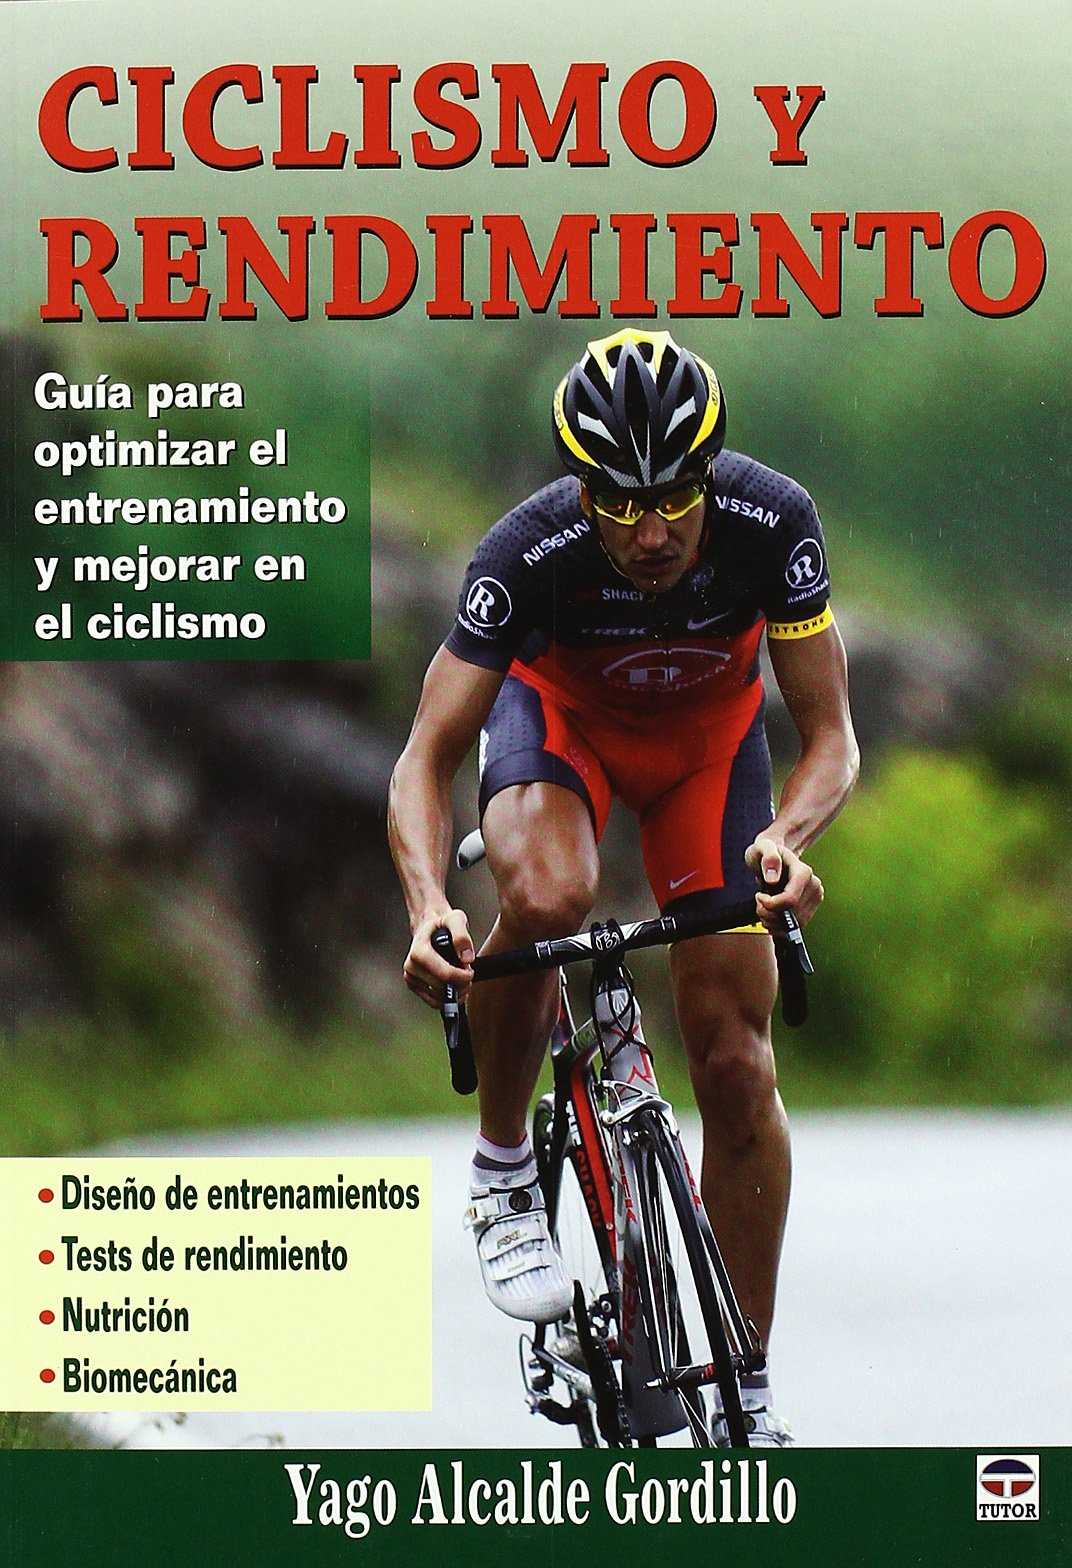 812Nn4xgwAL - Libros de Ciclismo